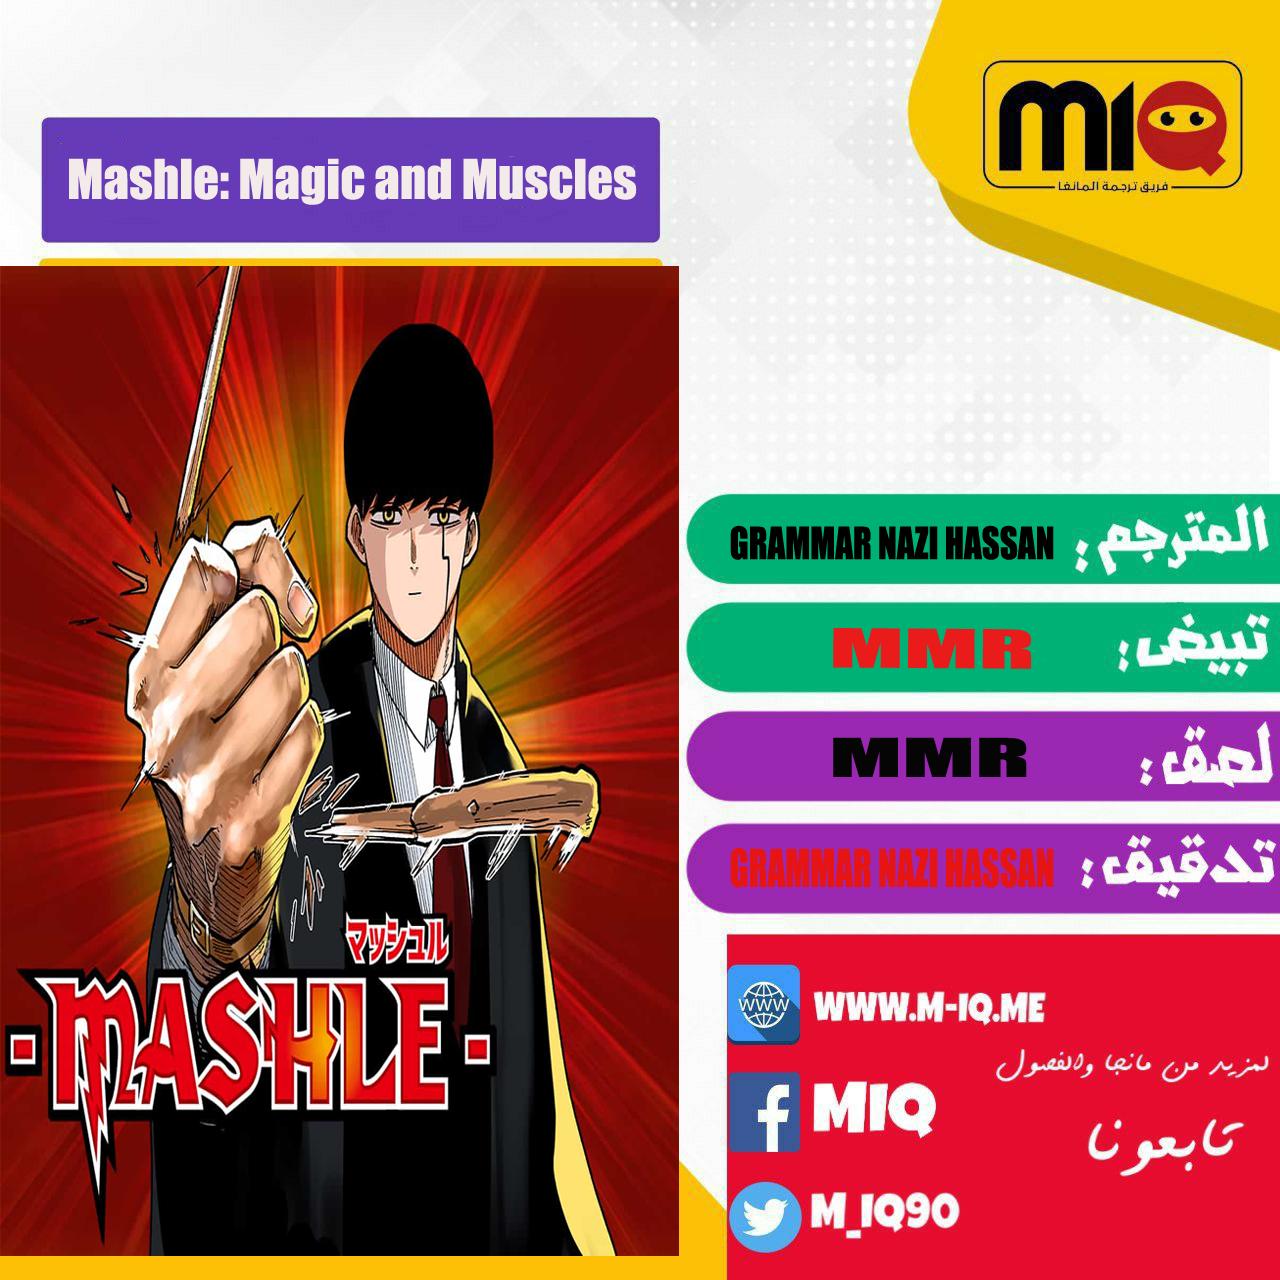 الفصل 1 Mashle: magic and muscles